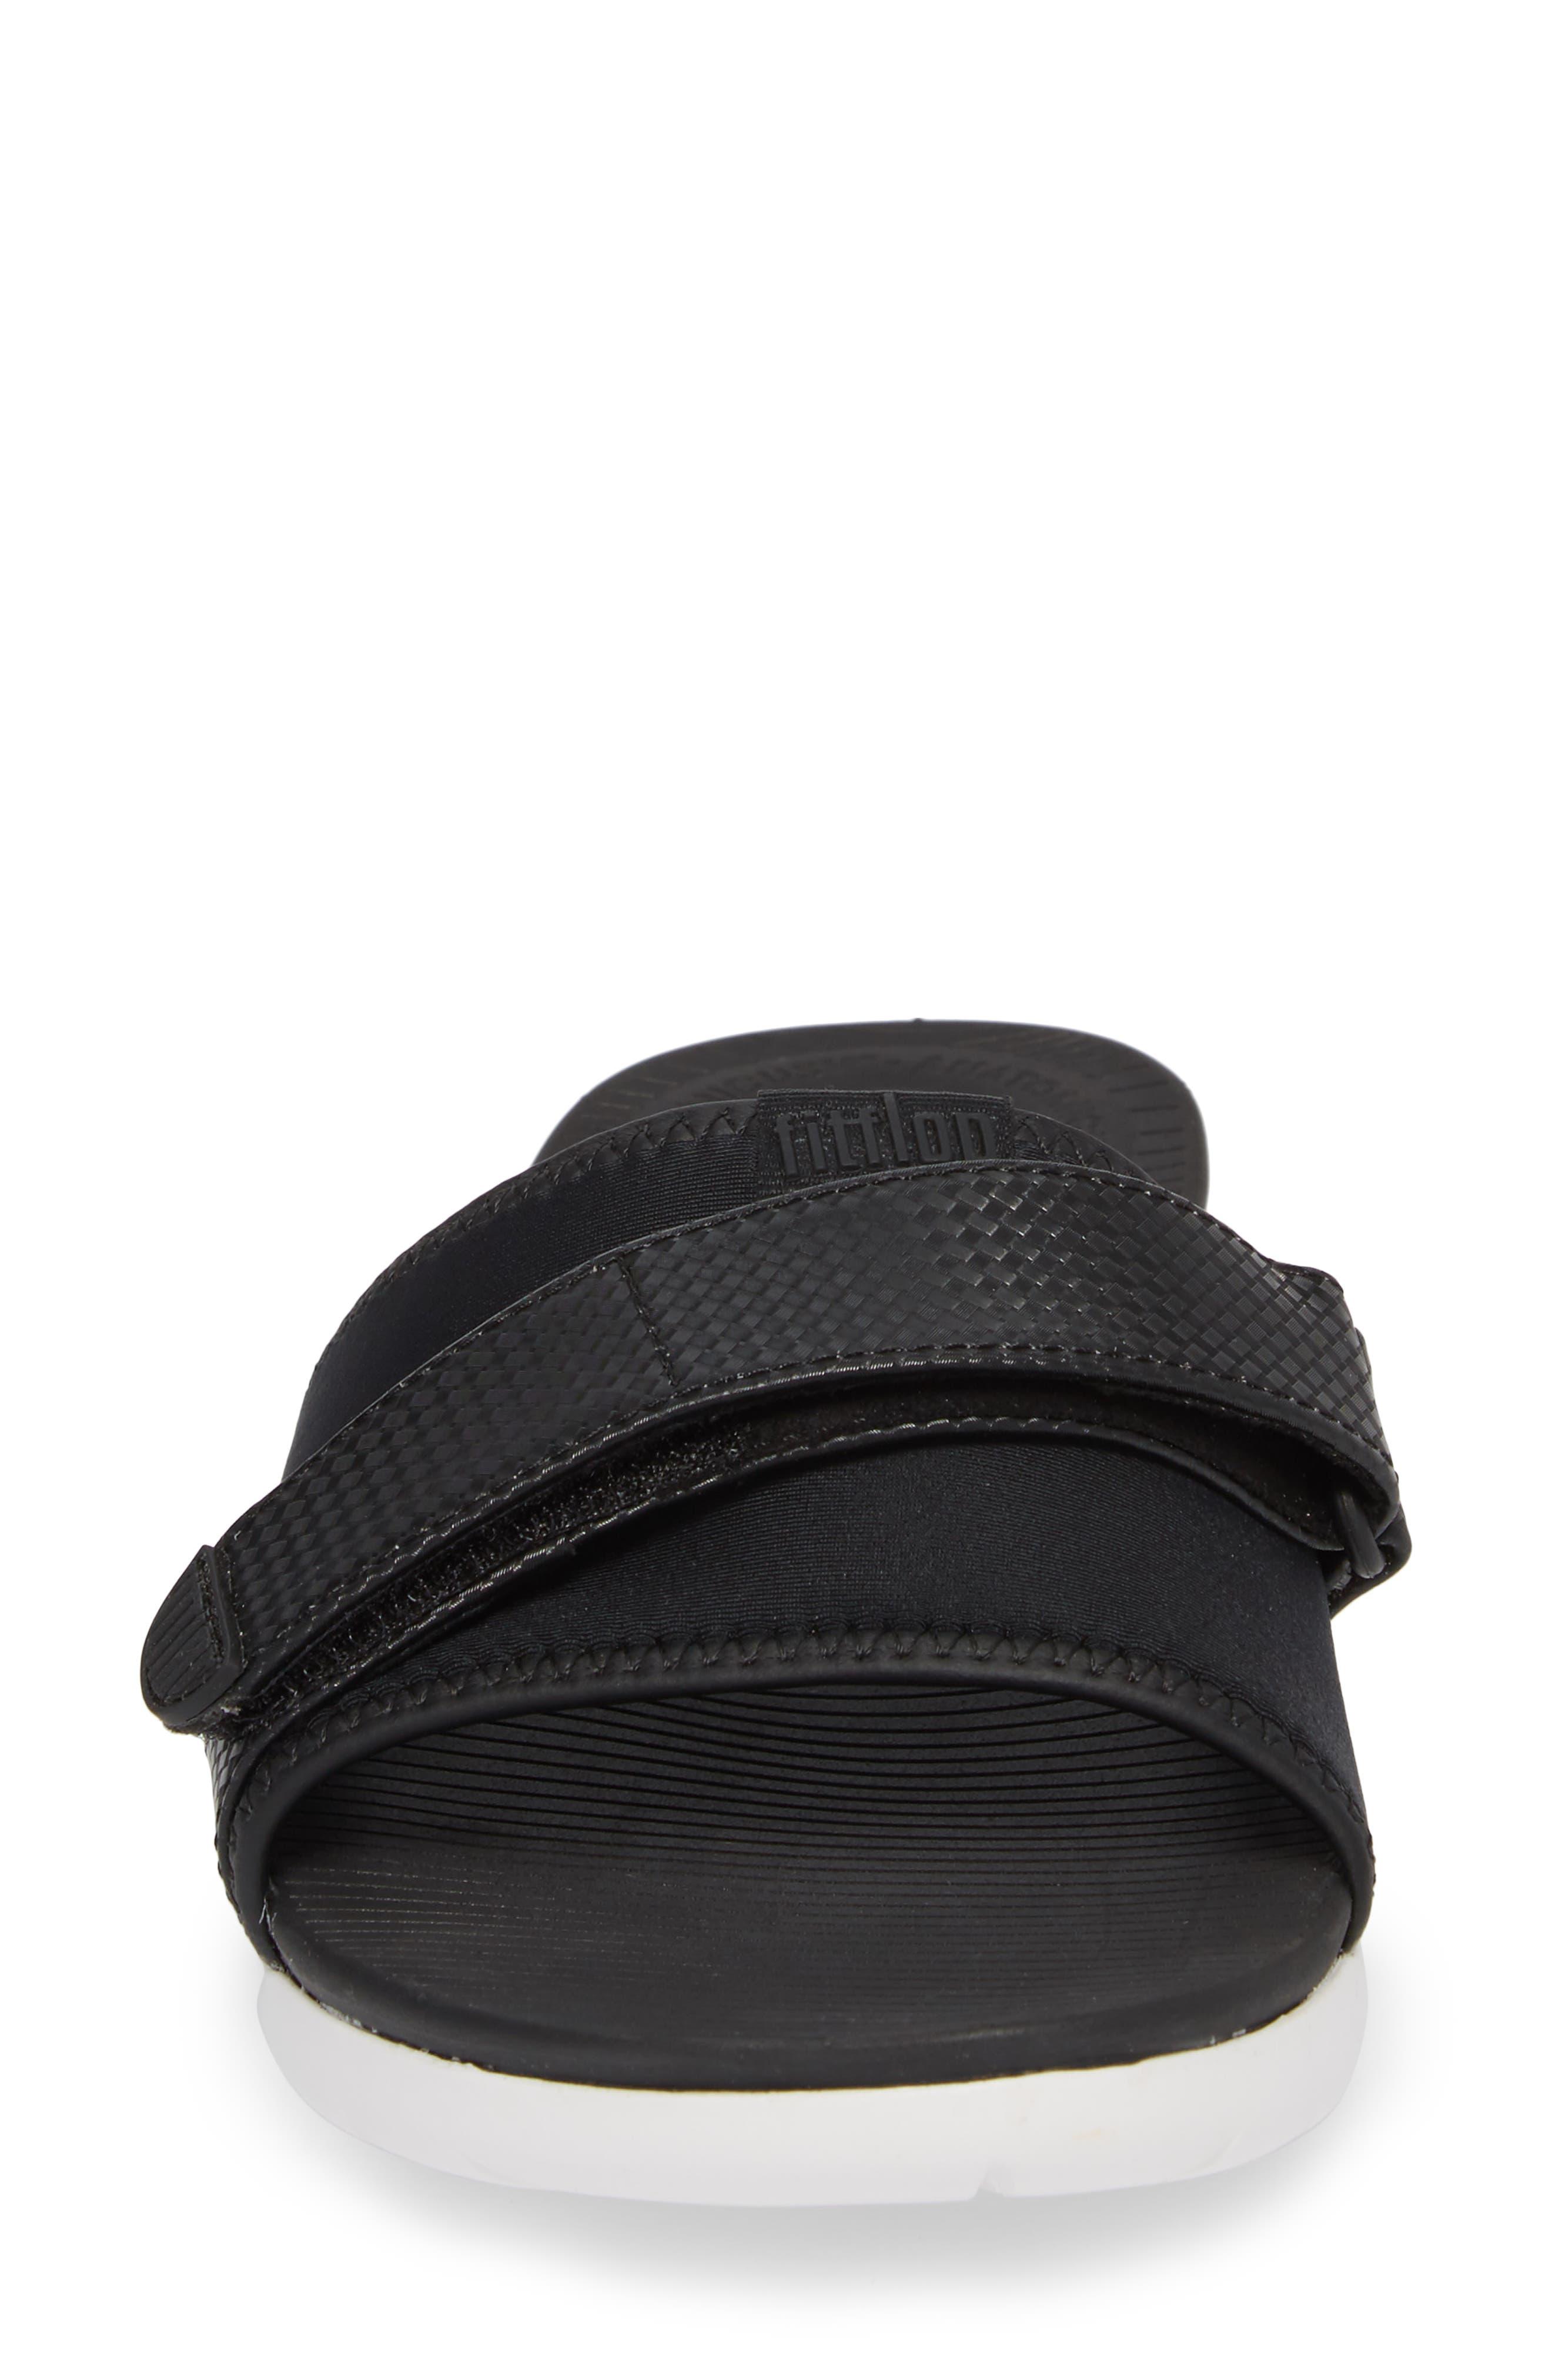 Neoflex Slide Sandal,                             Alternate thumbnail 4, color,                             BLACK FABRIC